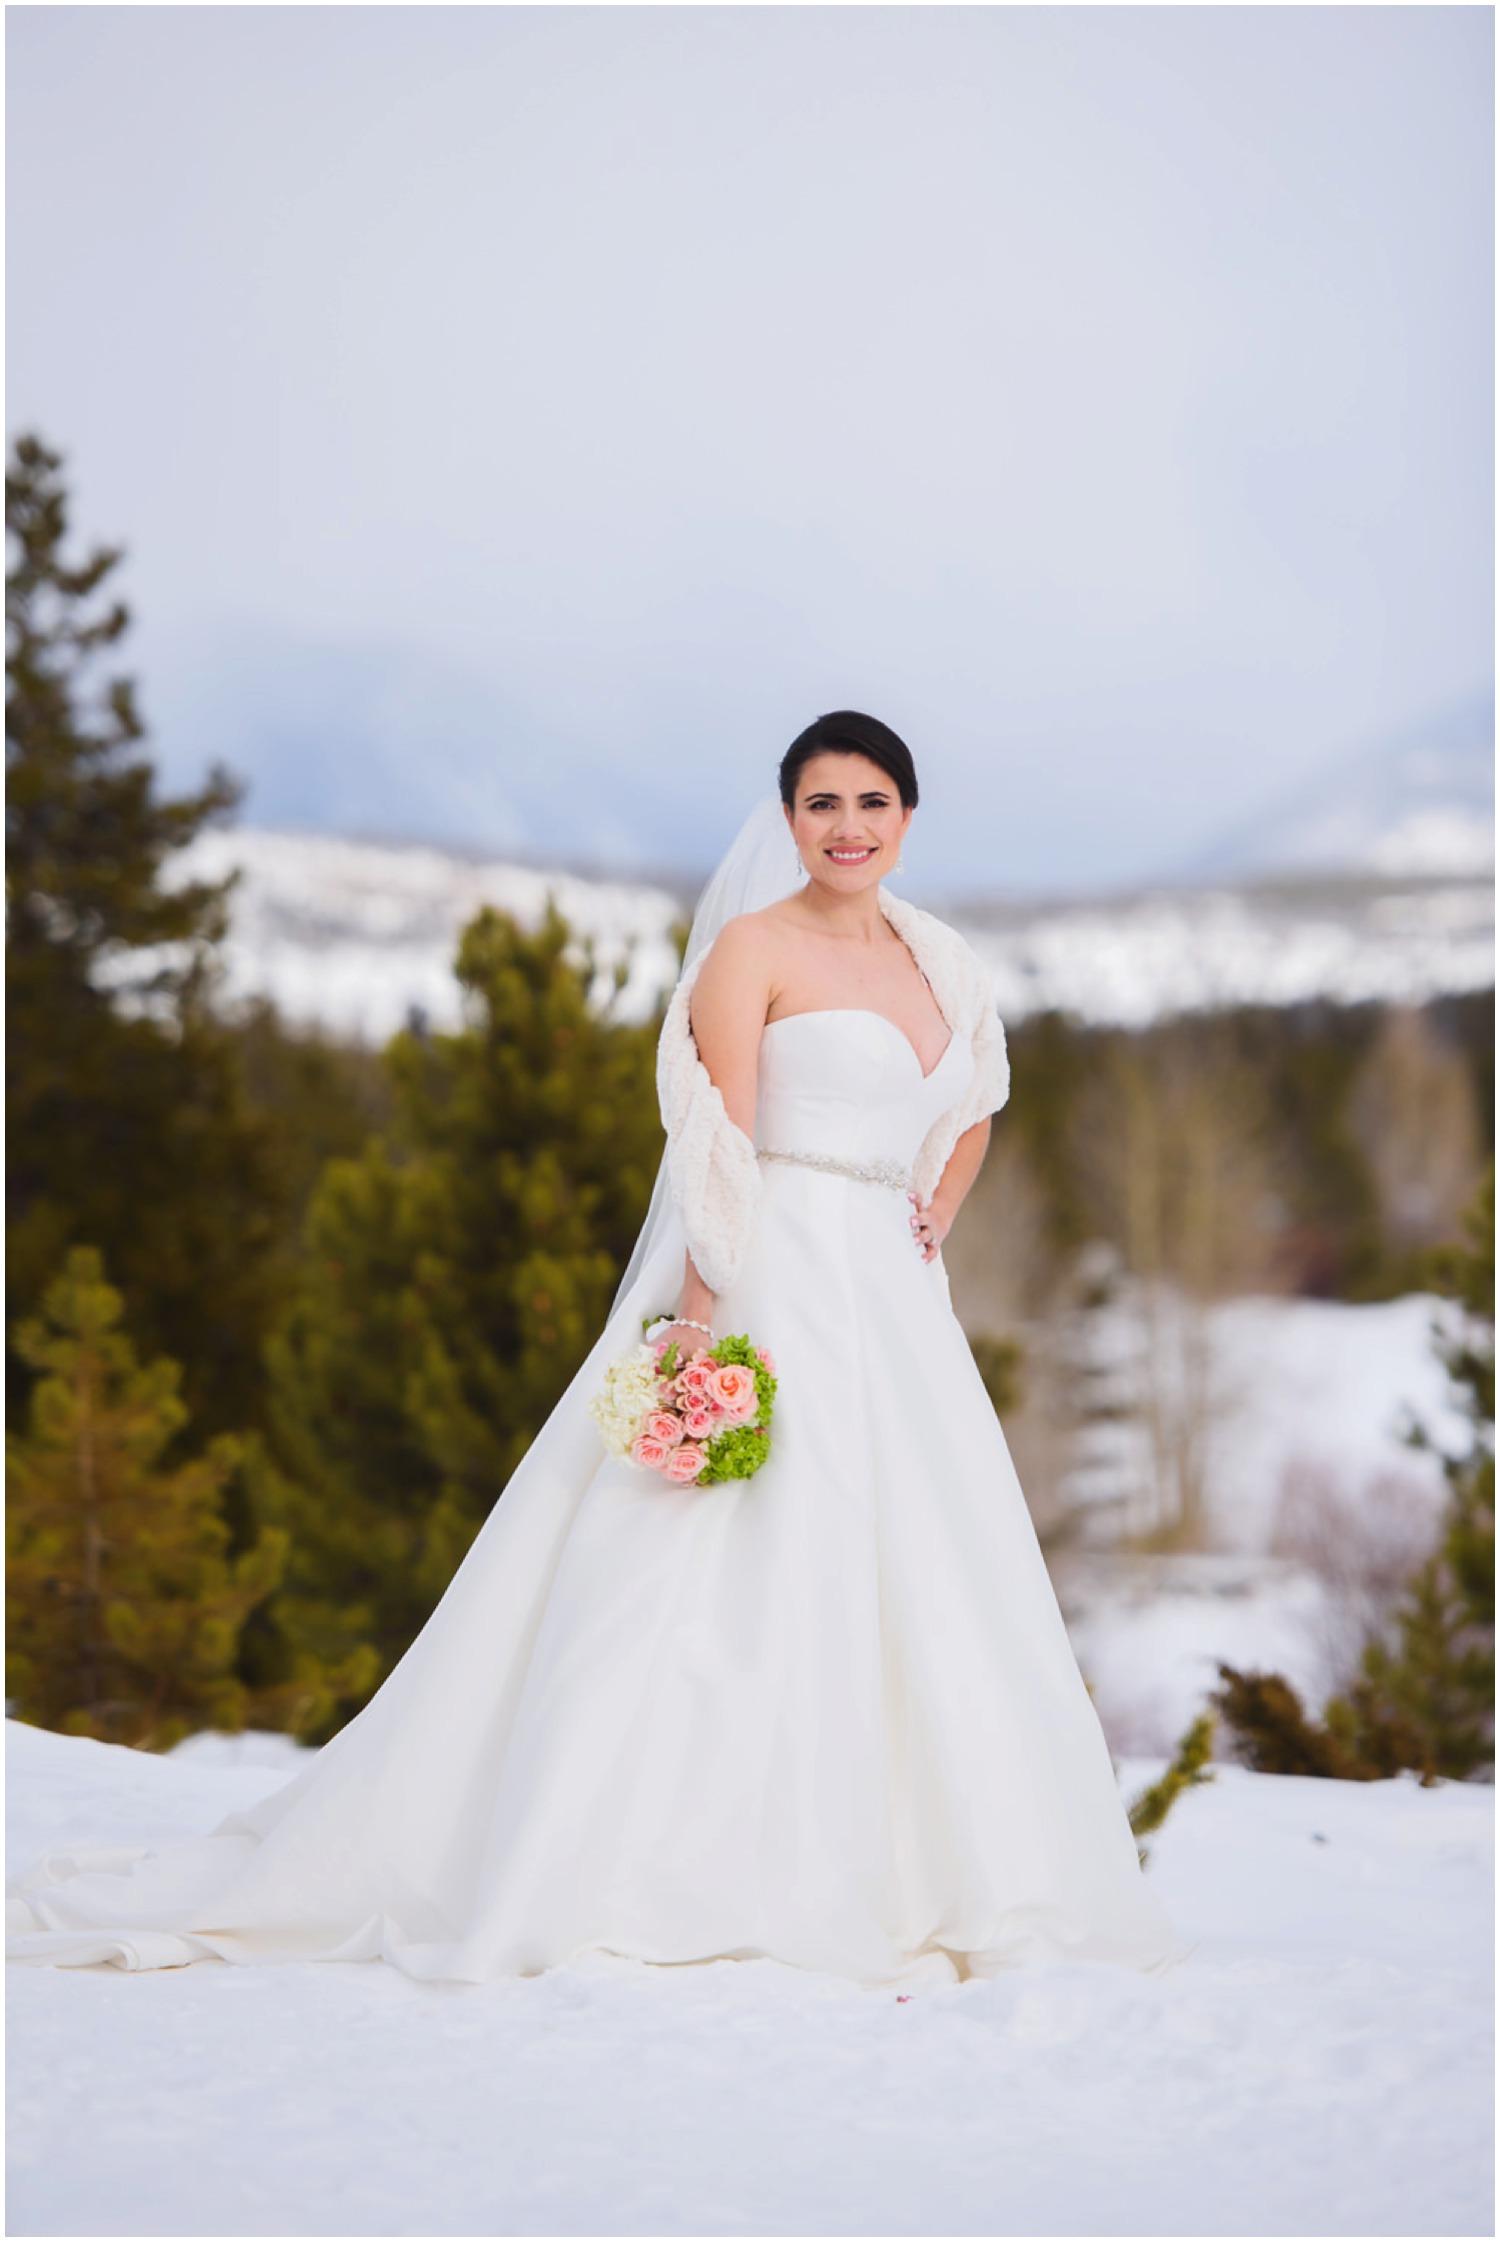 Colorado Bride in winter at Lake Dillon